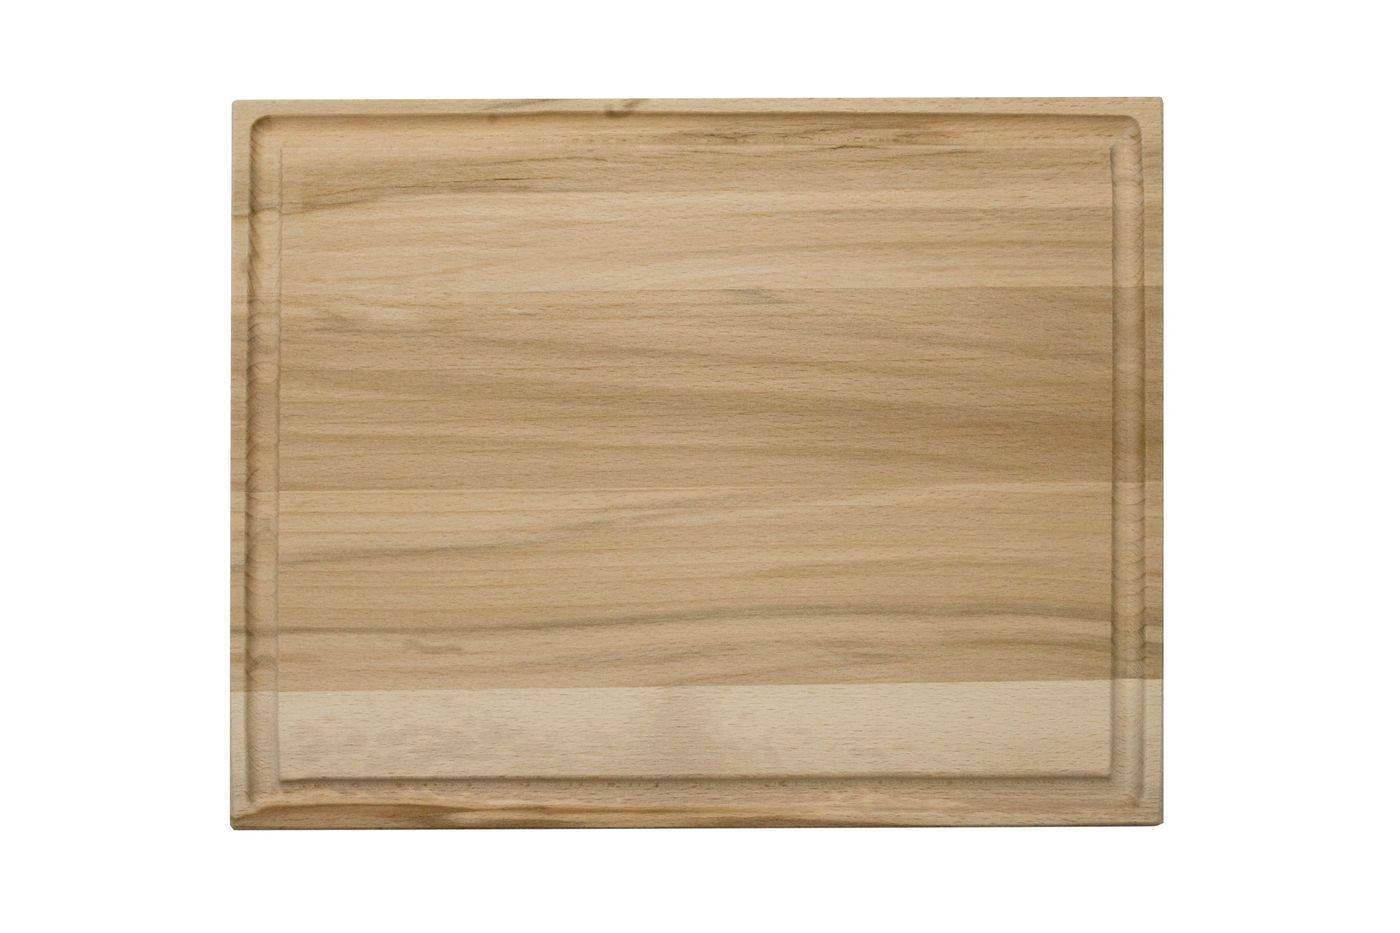 Deska na maso s drážkou, 350 x 270 x 20 mm - Dřevovýroba Otradov